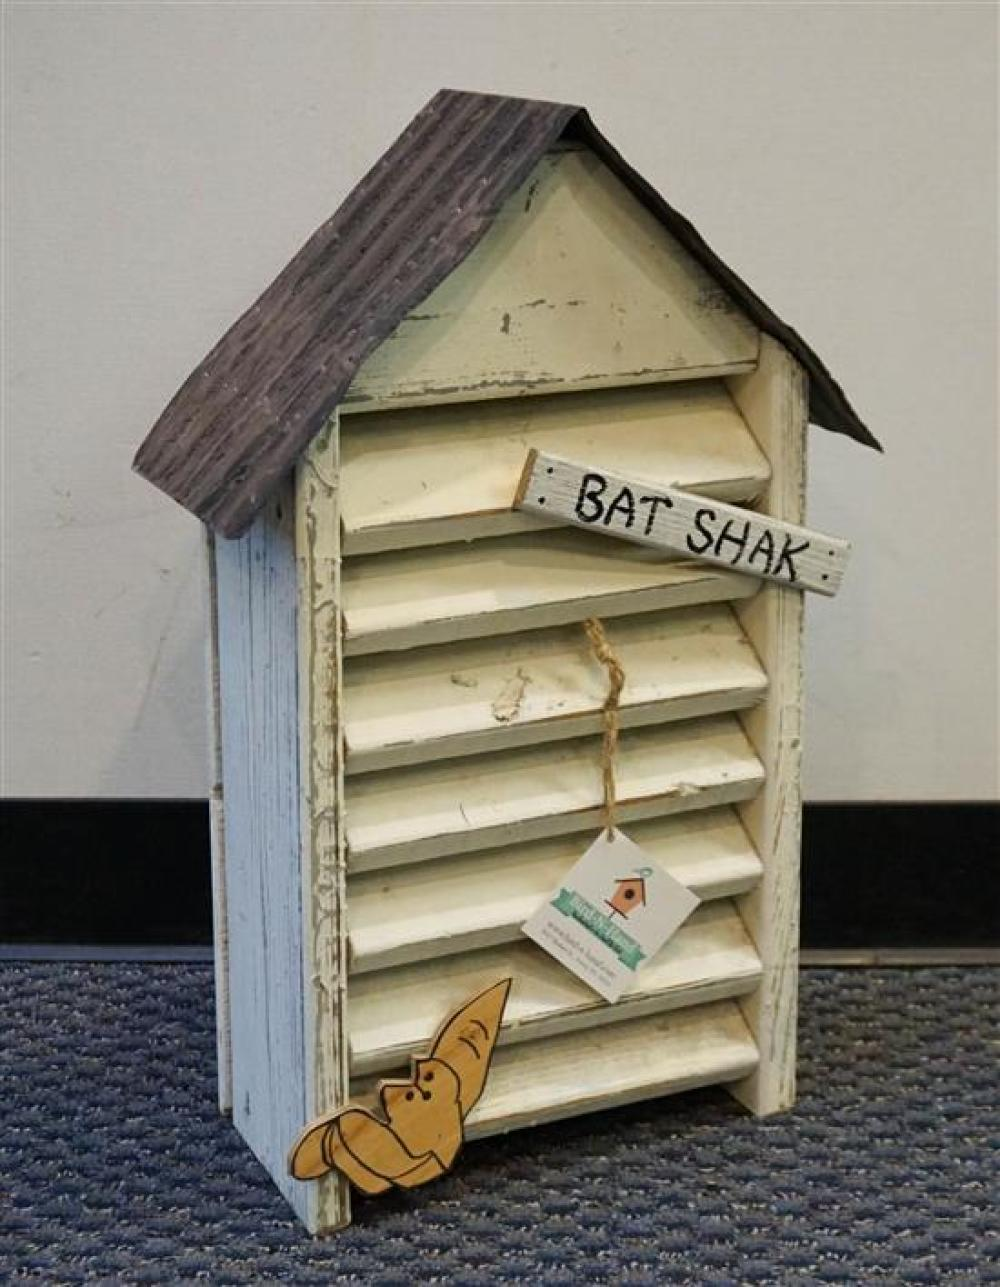 Painted Wood 'Bat Shak'